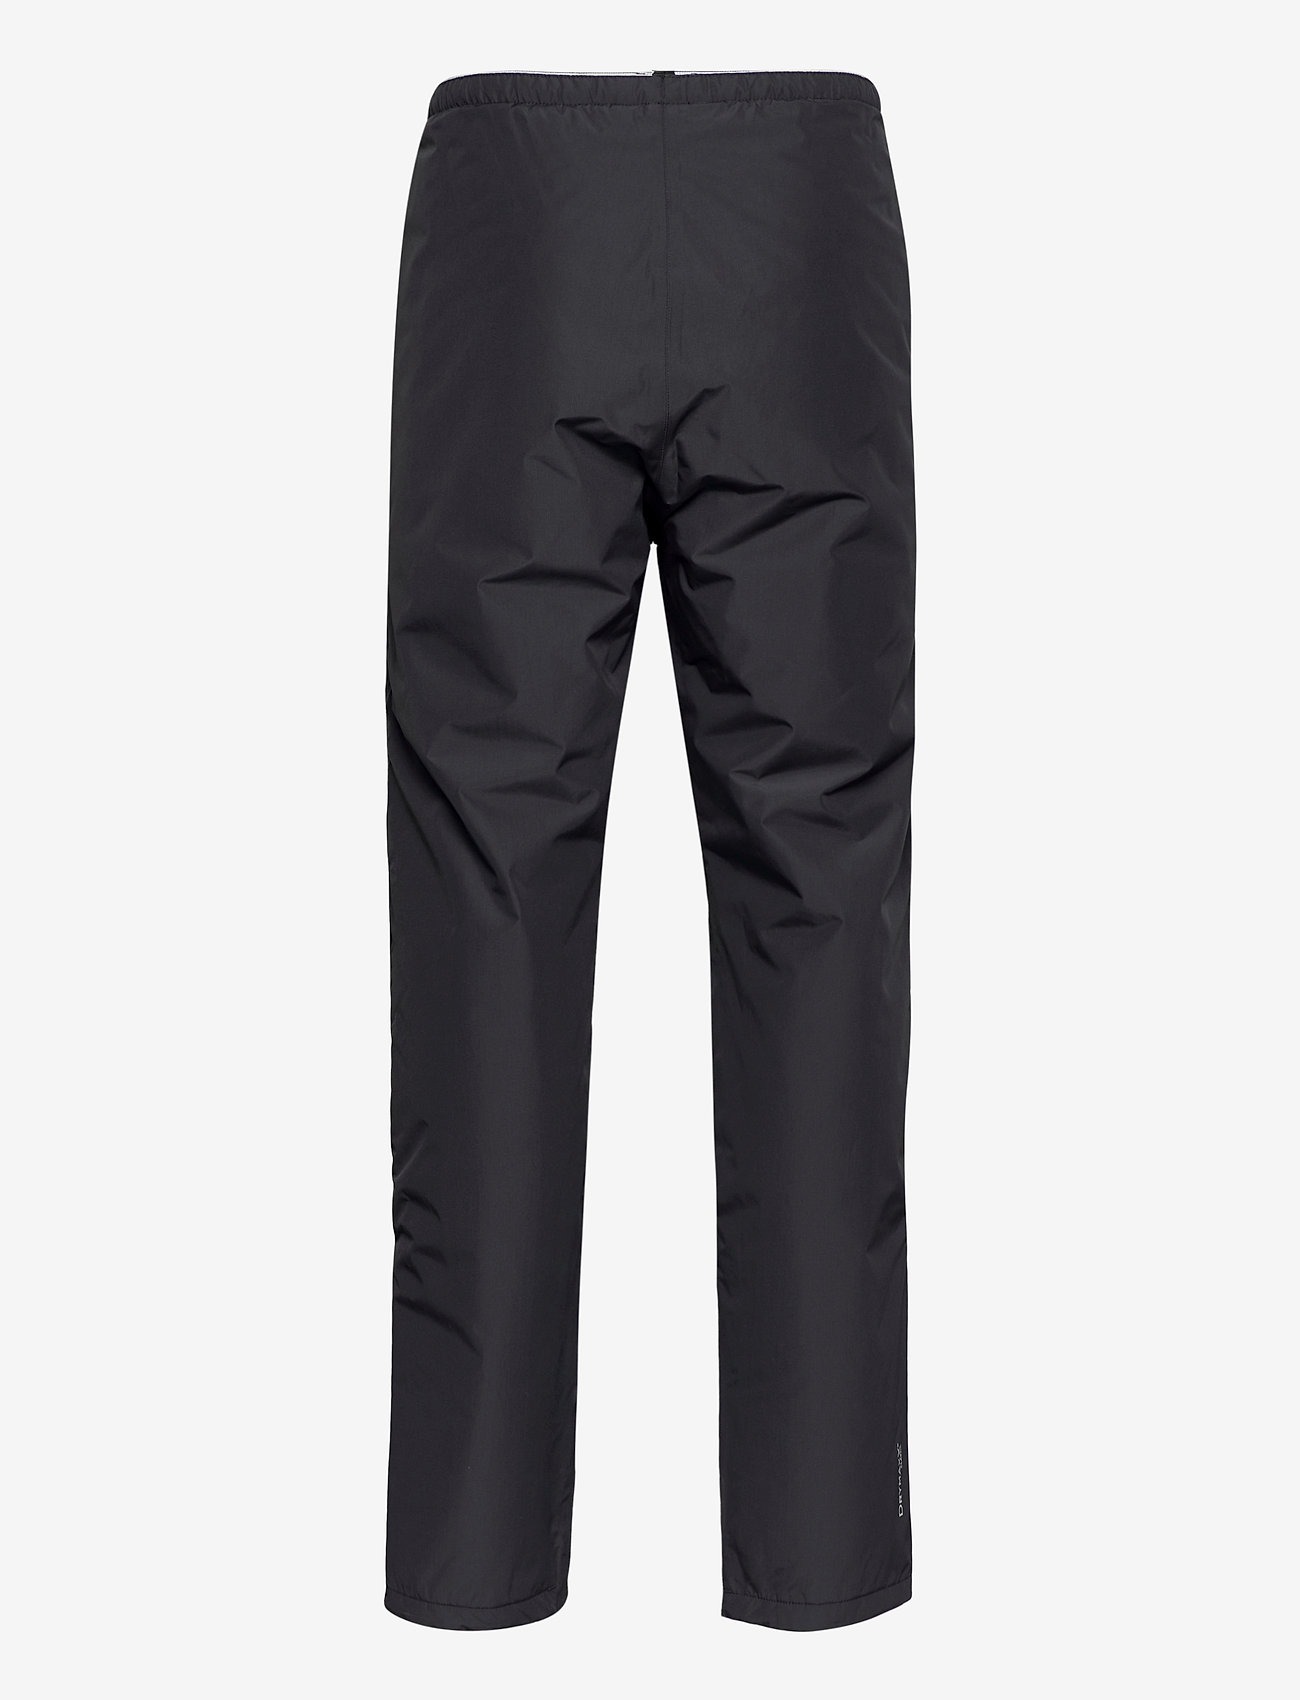 Caima Men's Warm Drymaxx Shell Pants (Black) (99.90 €) - Halti Cyx0I